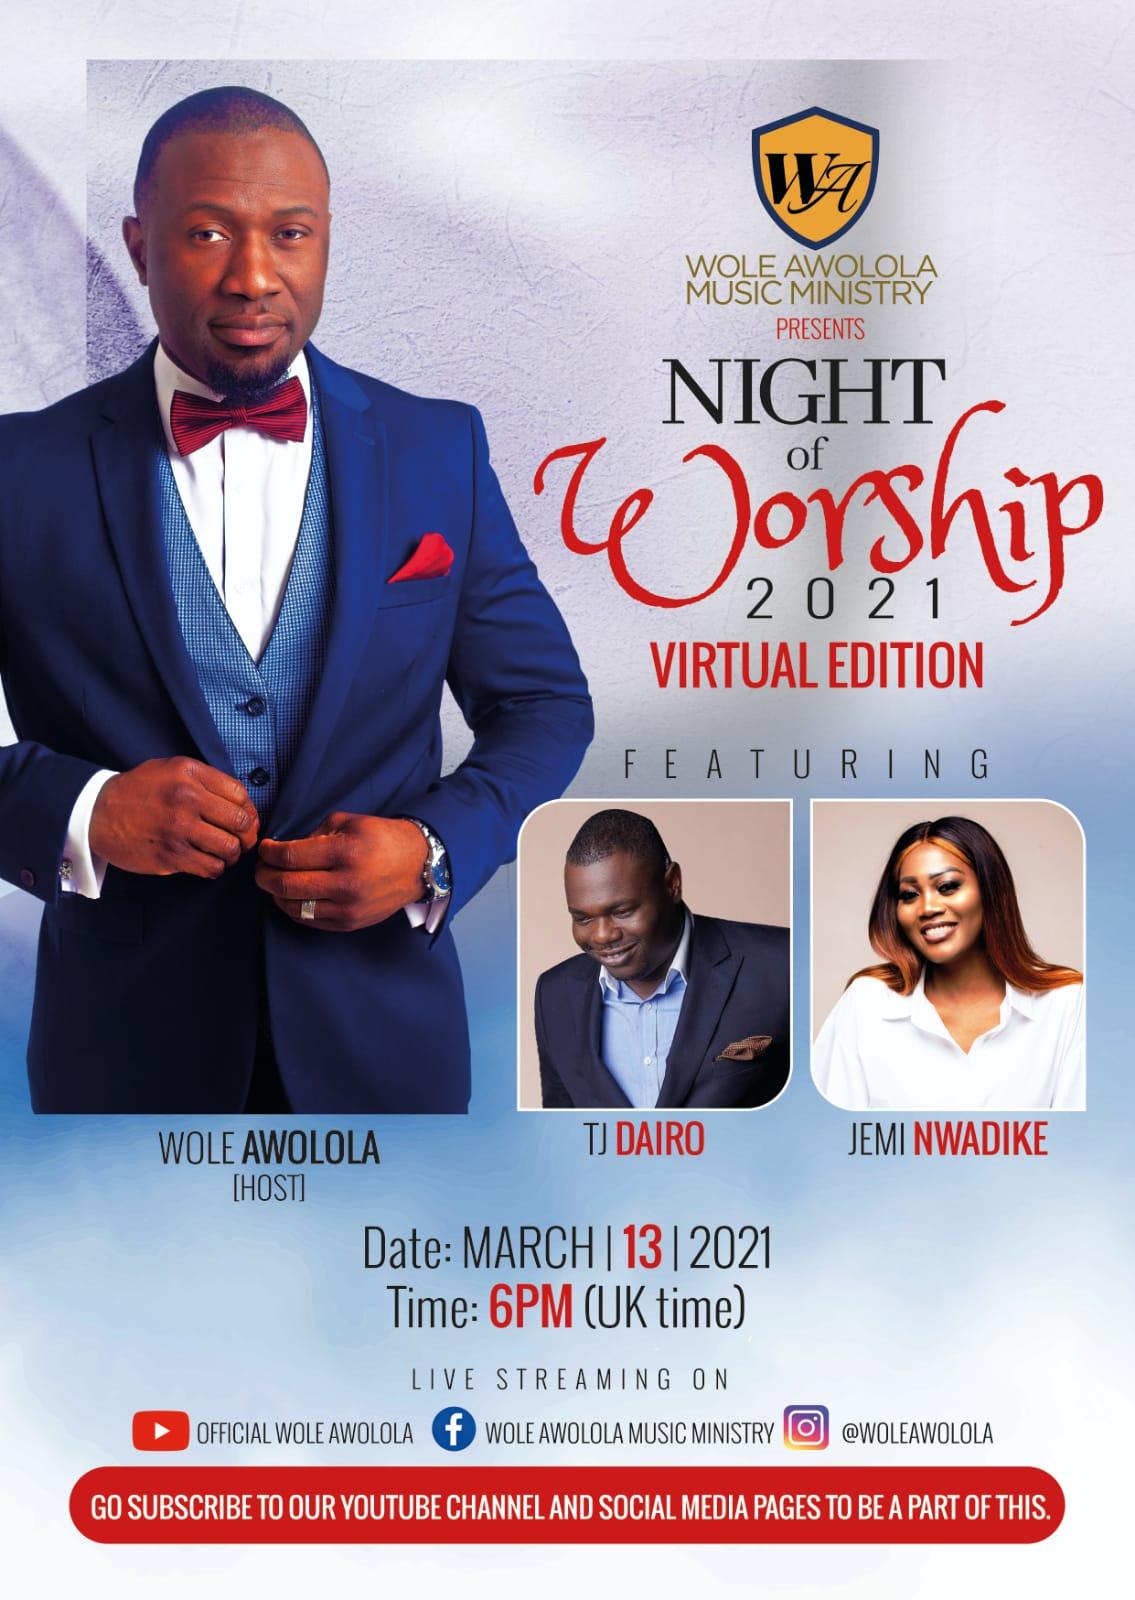 Wole Awolola Music Ministry Presents Night Of Worship 2021 (Virtual Edition) March 13th.